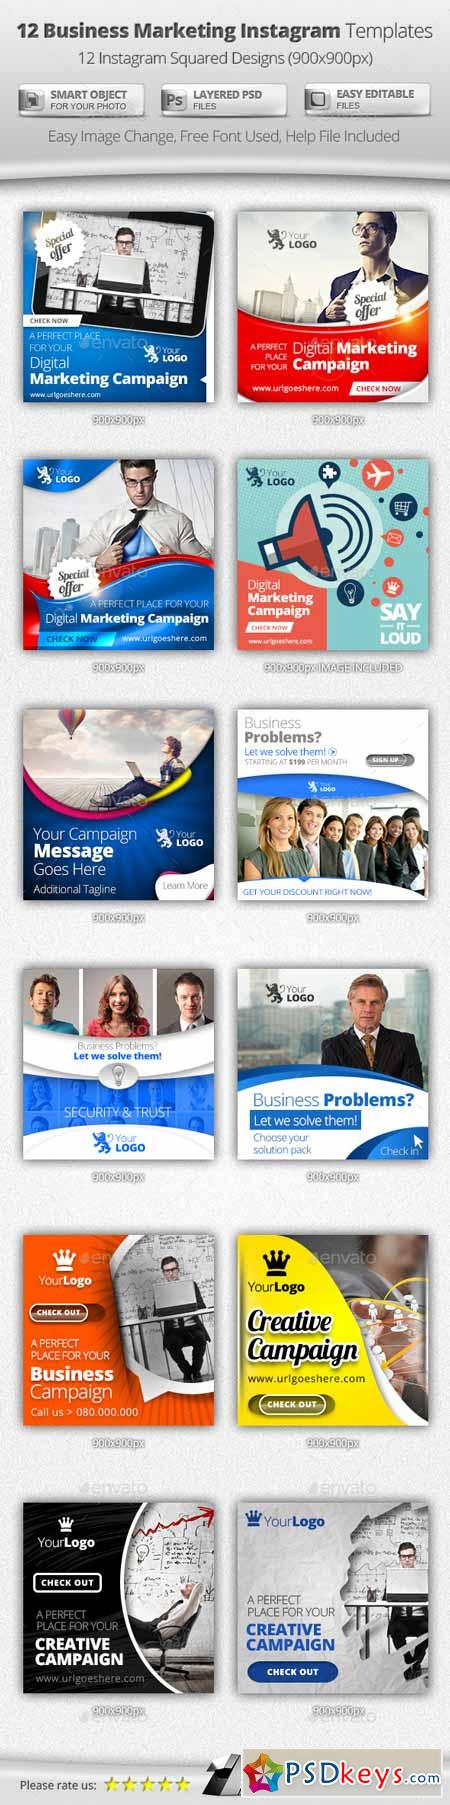 Business Digital Marketing Instagram Templates 11327637 » Free ...